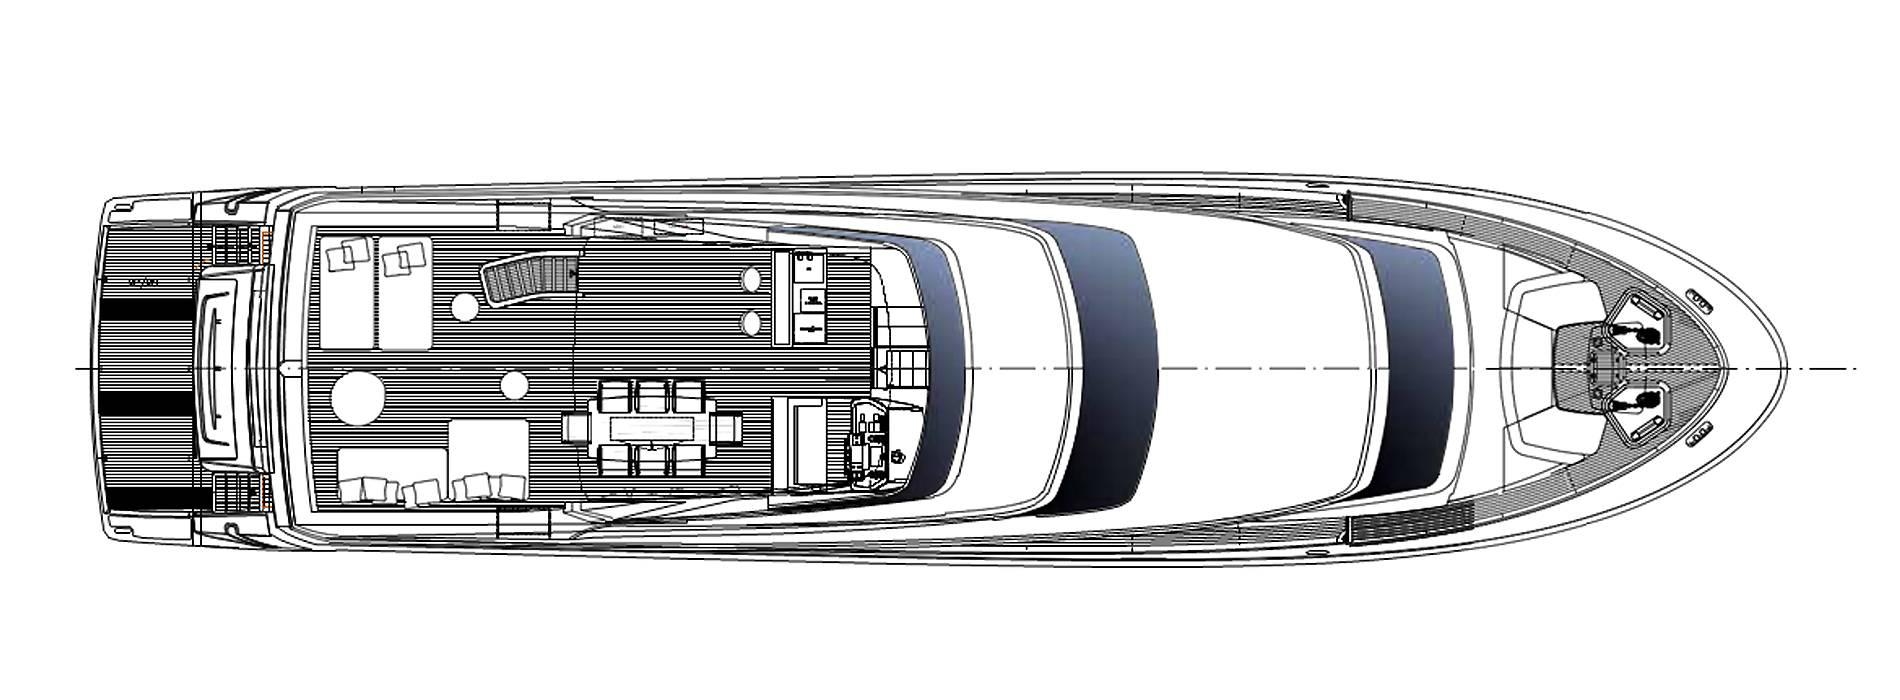 Sanlorenzo Yachts SL96-623 Флайбридж